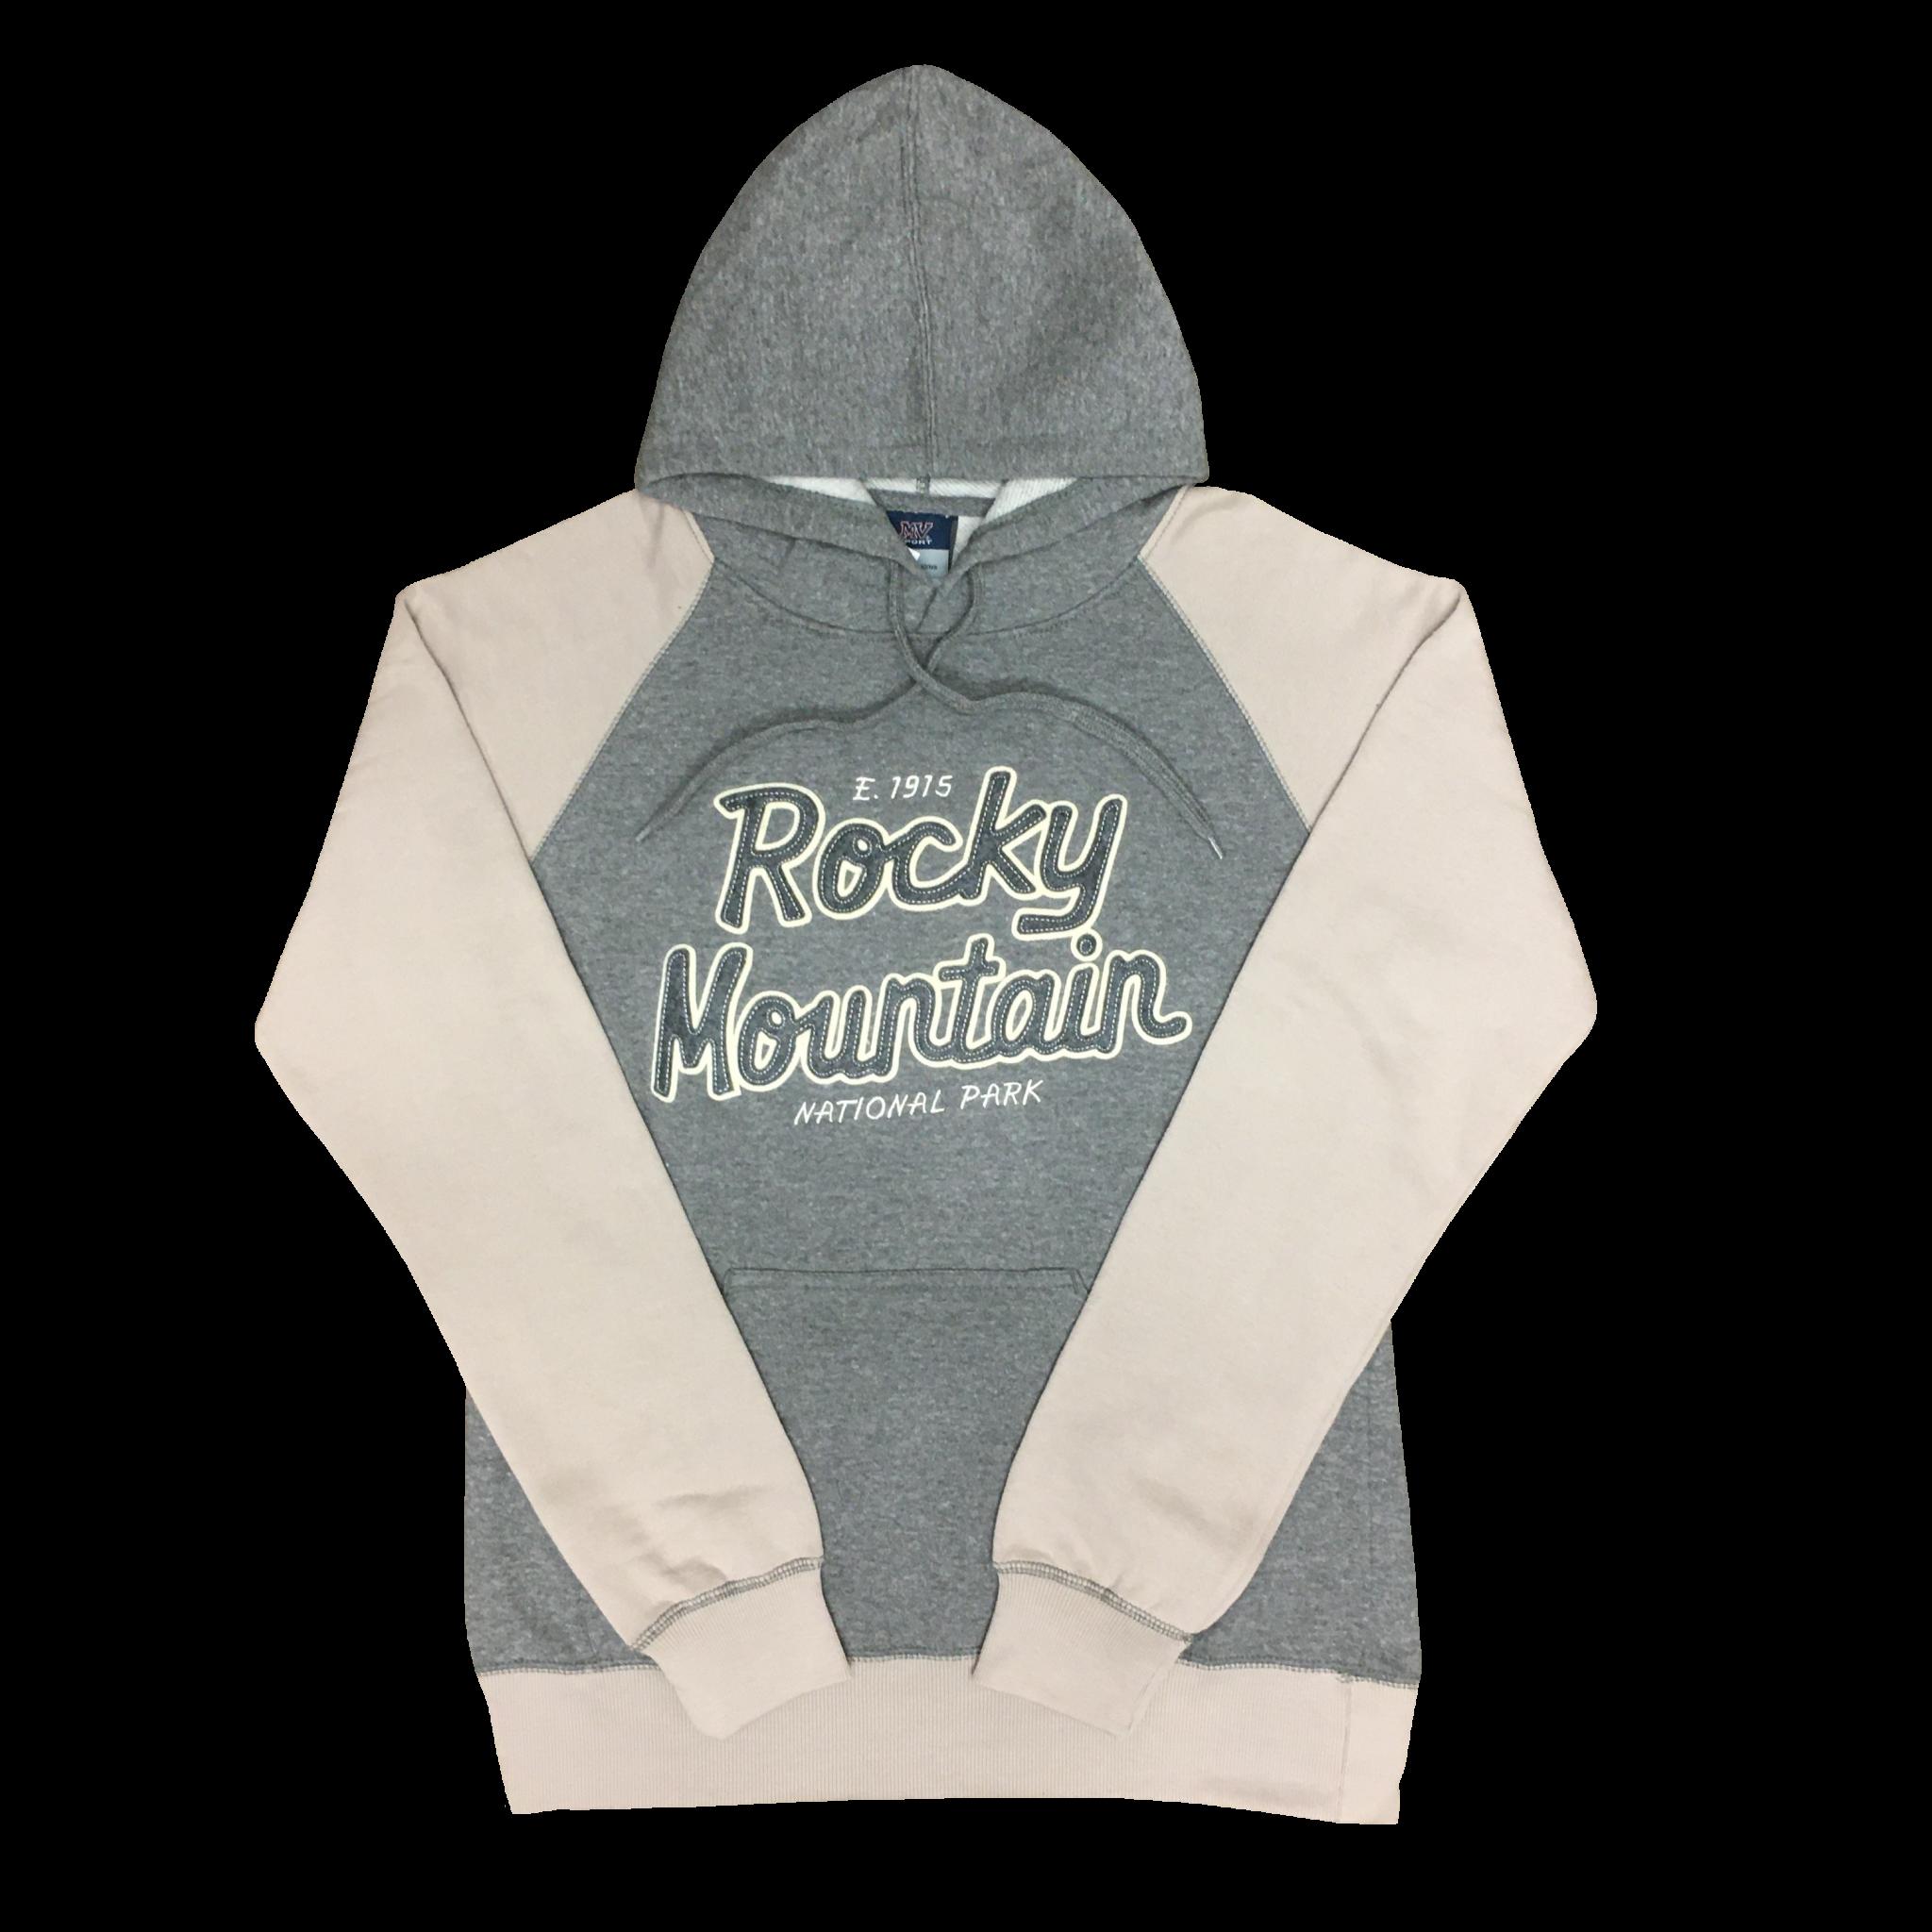 RMNP sweatshirt